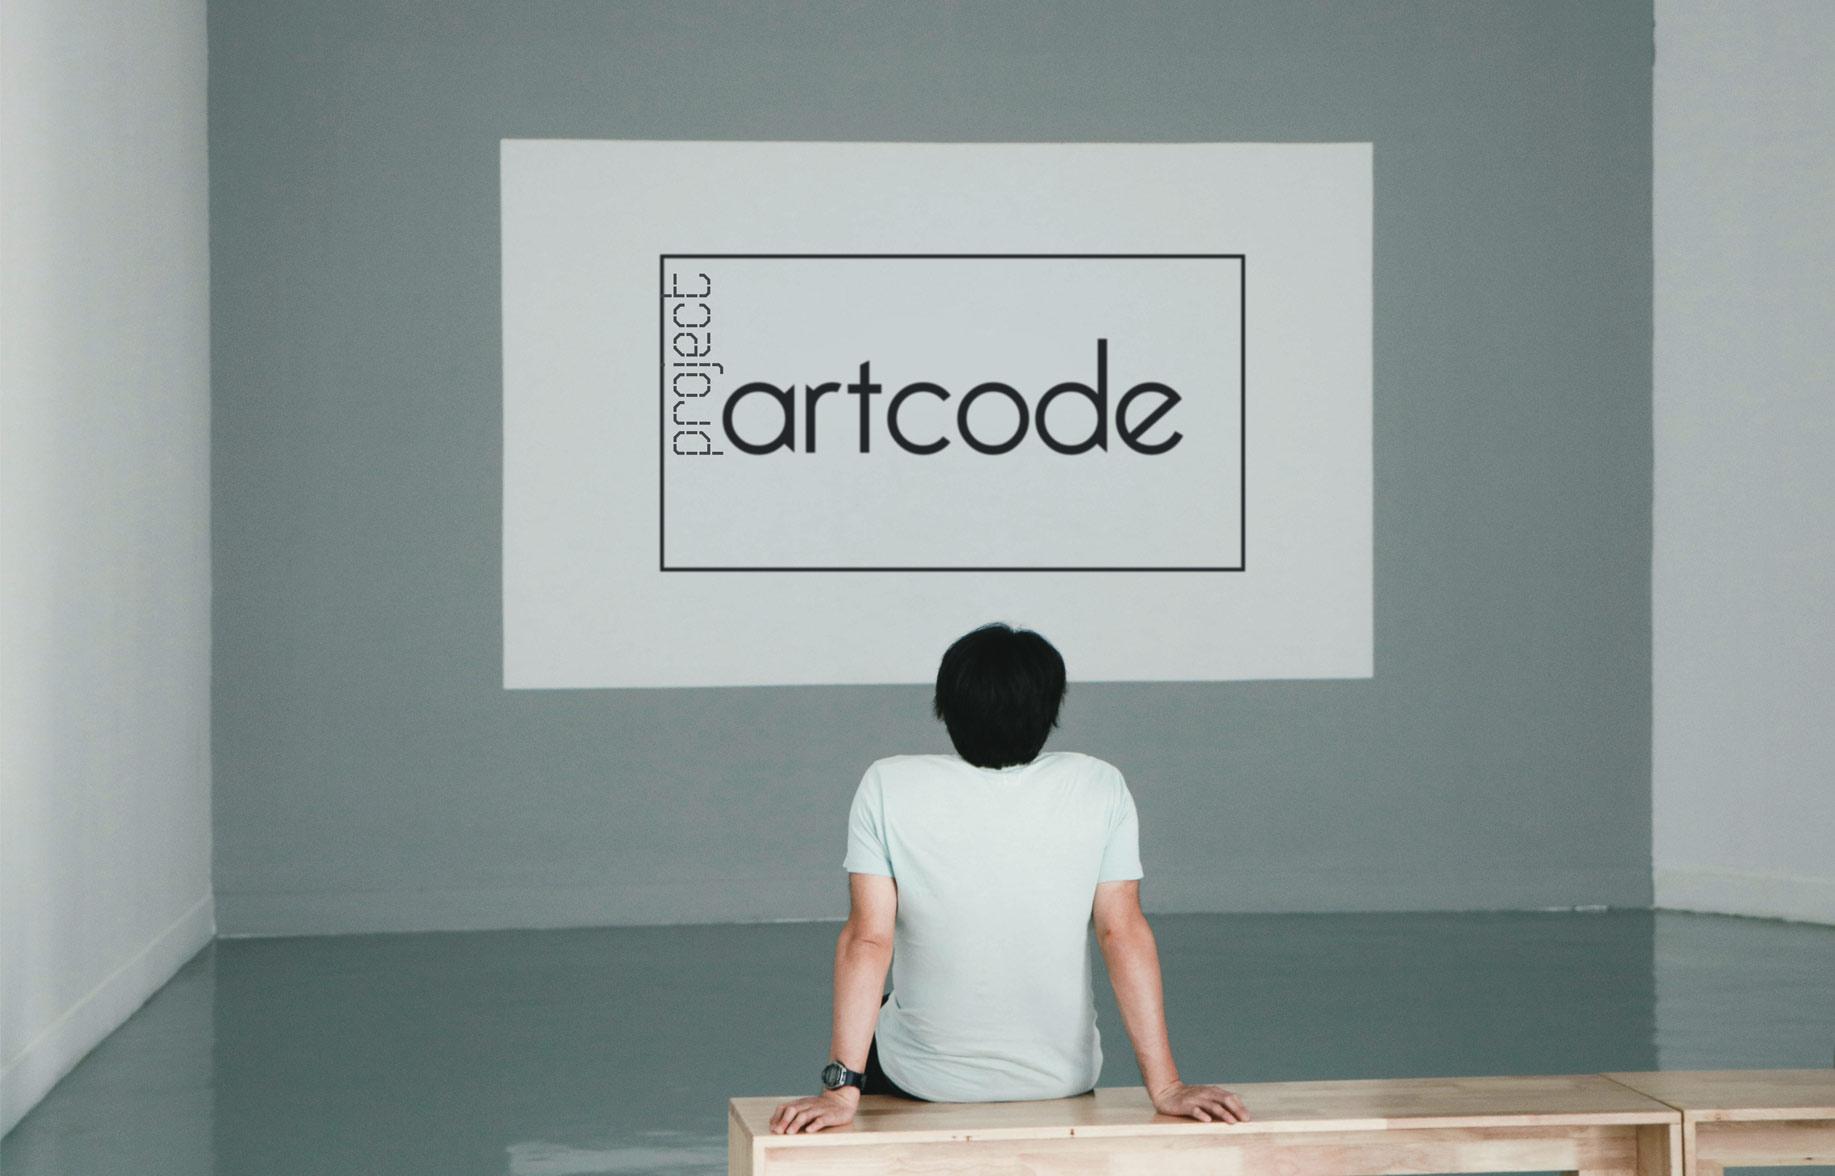 artcode-project-launching-video-scene